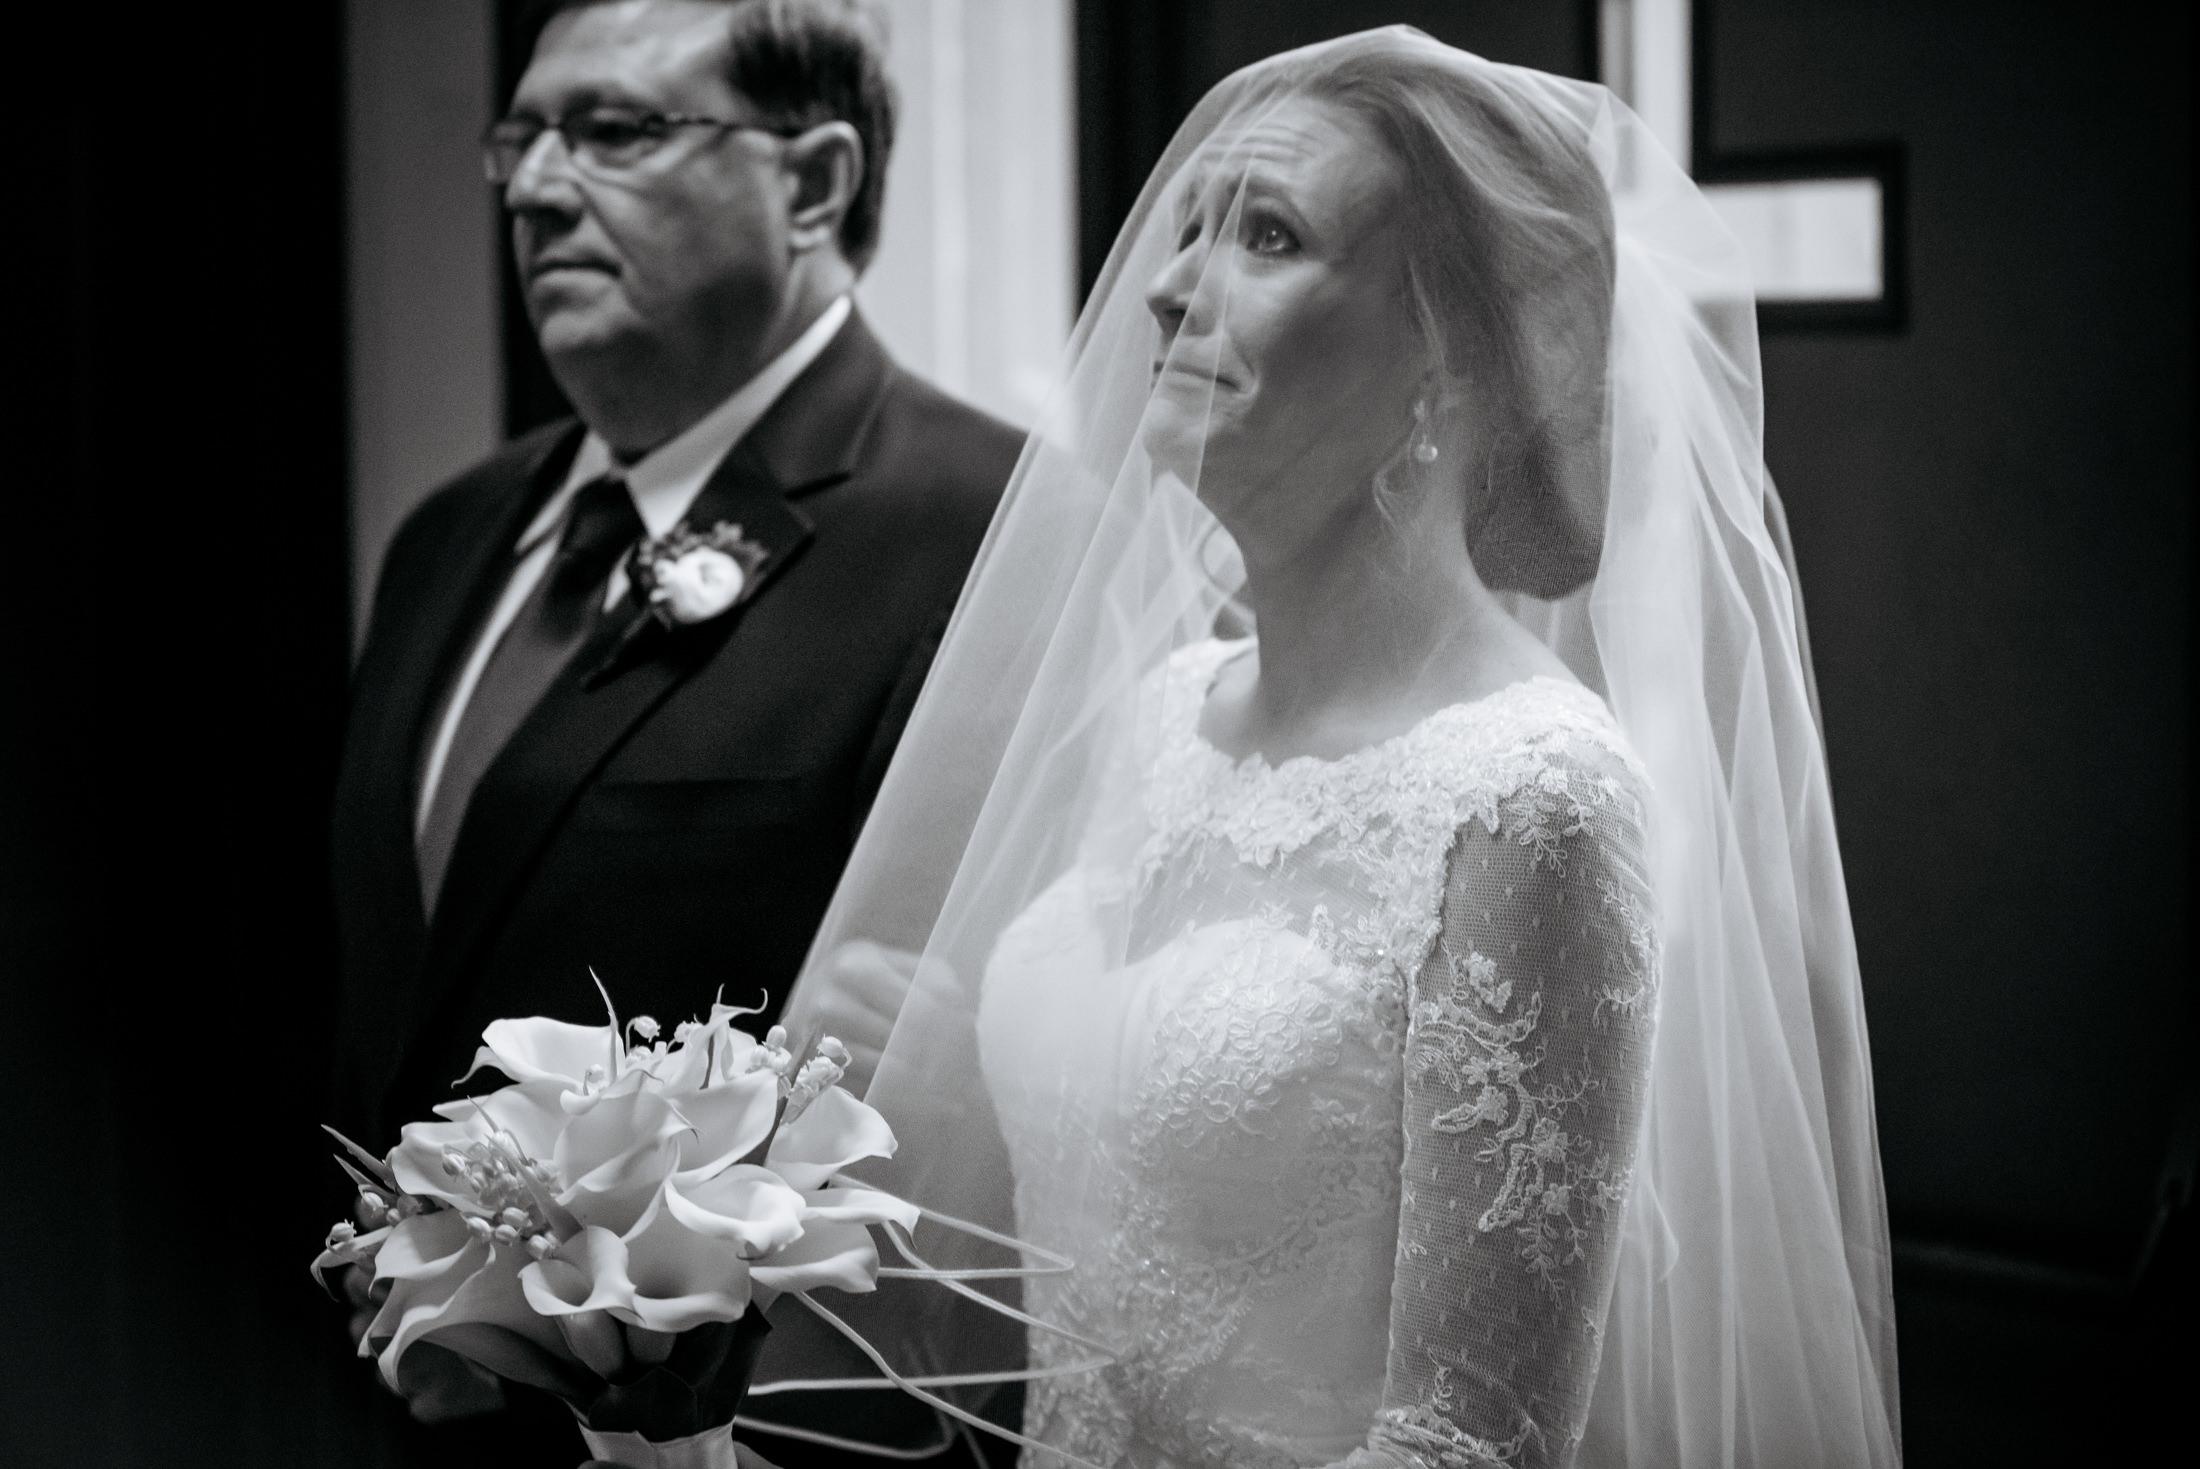 st-johns-creighton-omaha-wedding-photographer-jm-studios-0007.JPG